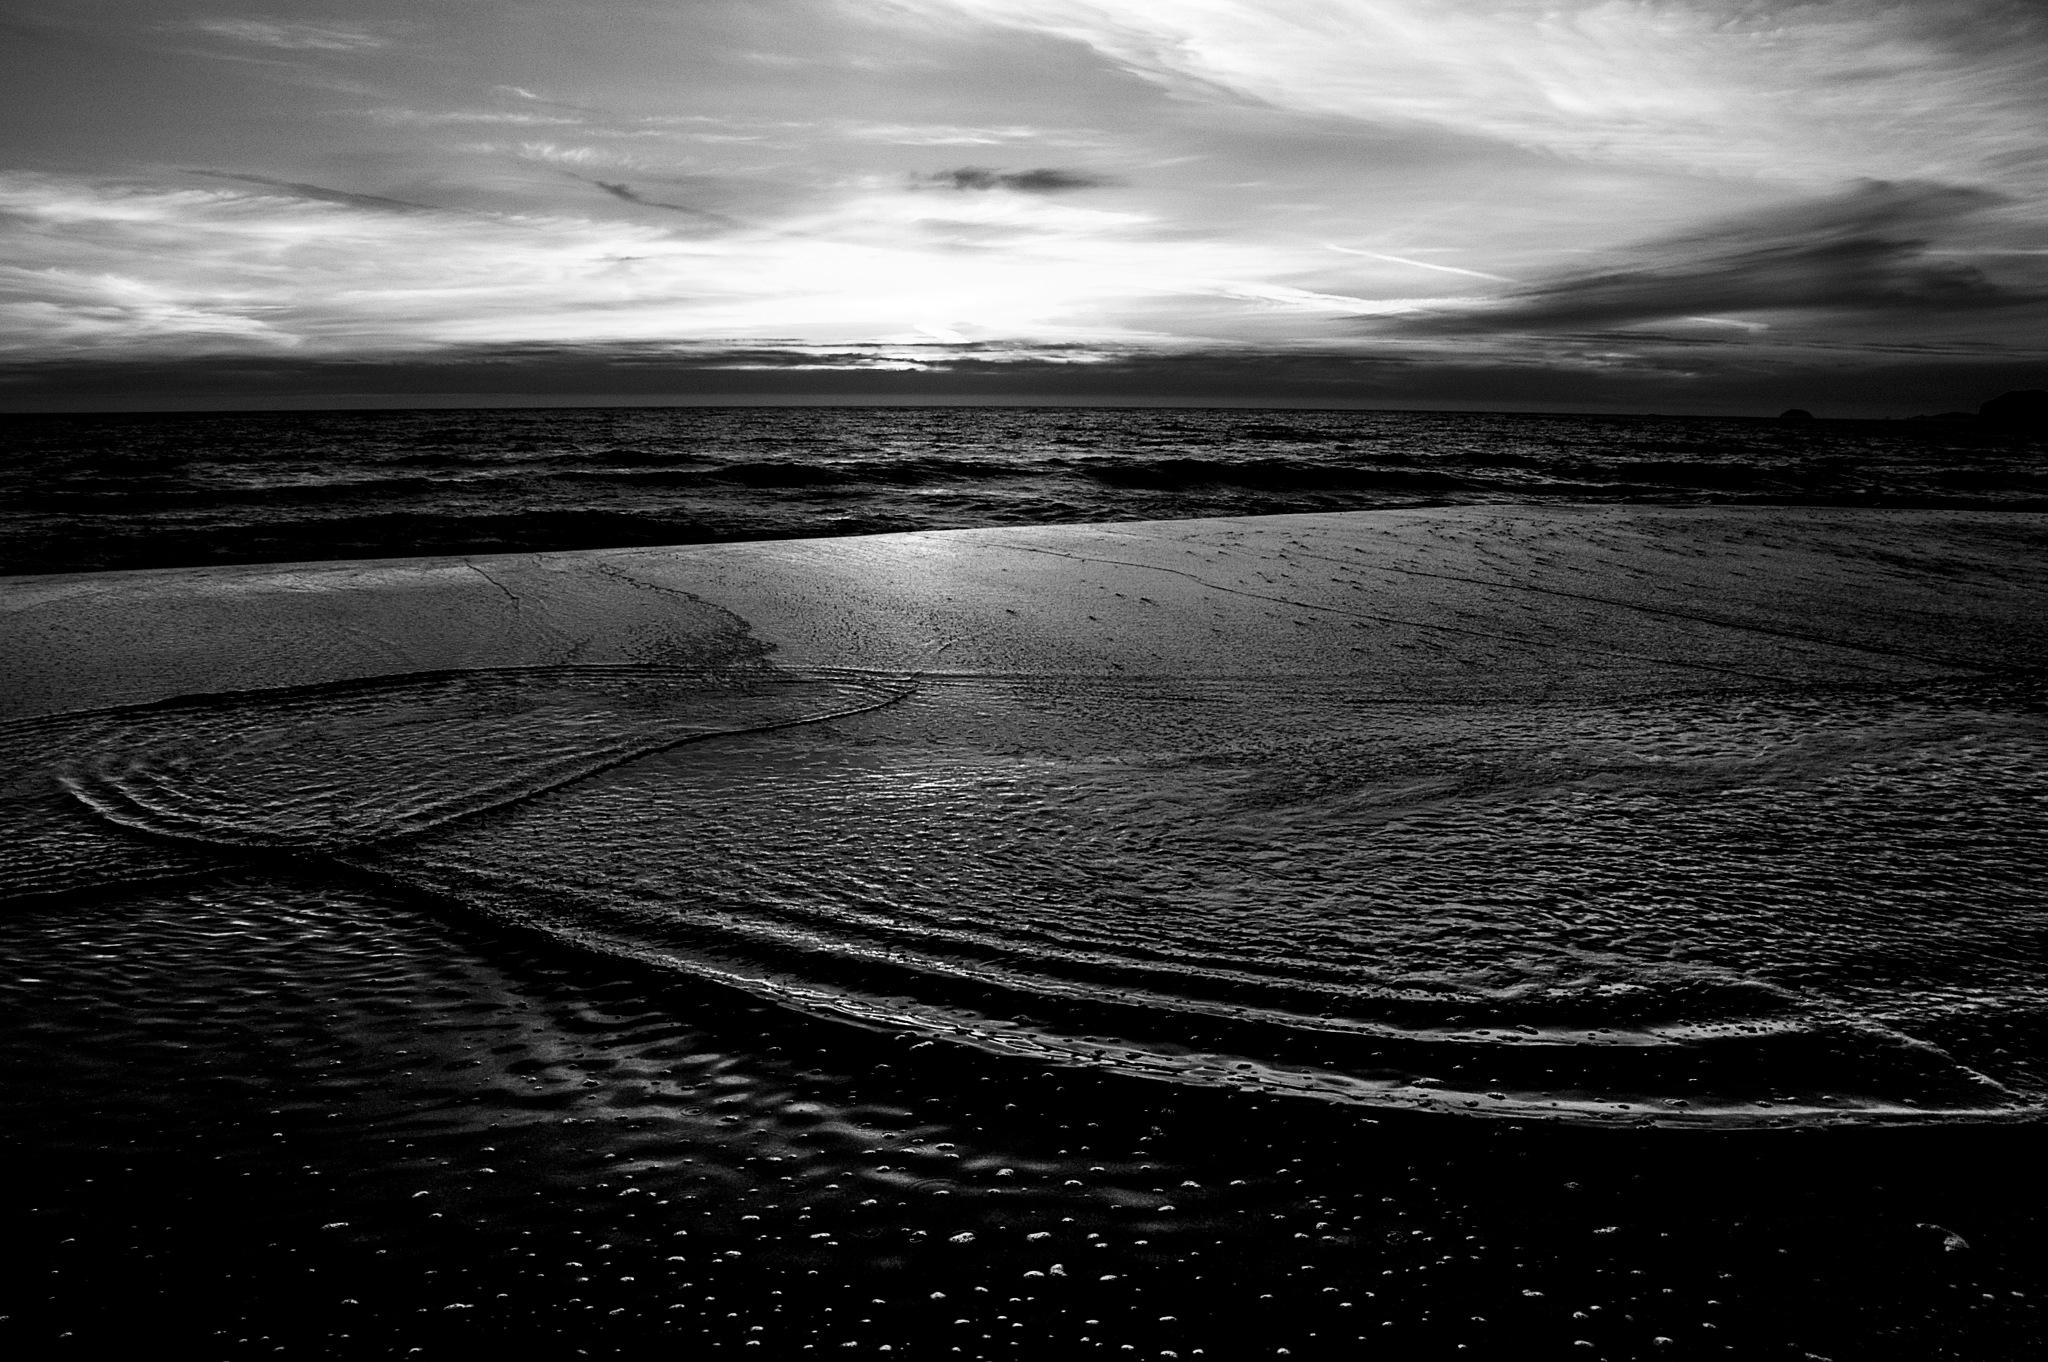 sunset on Oregon beach by sonny_roger_sonneland